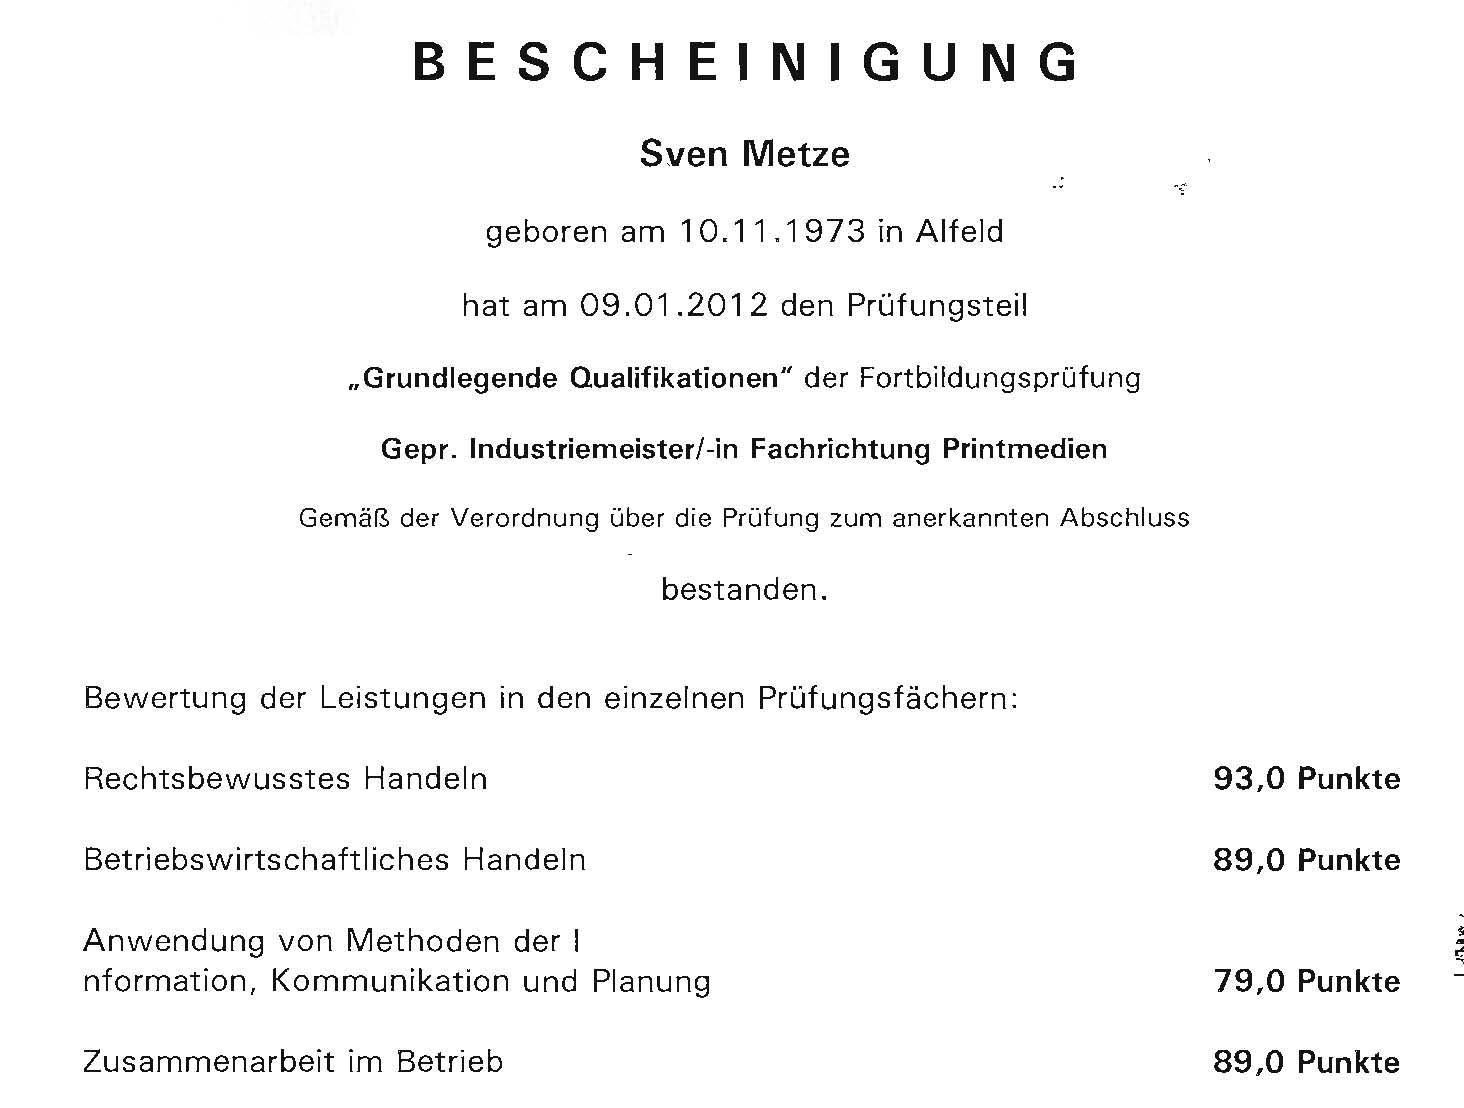 Ergebnis GQ 2012 IHK Sven Metze, Alfeld